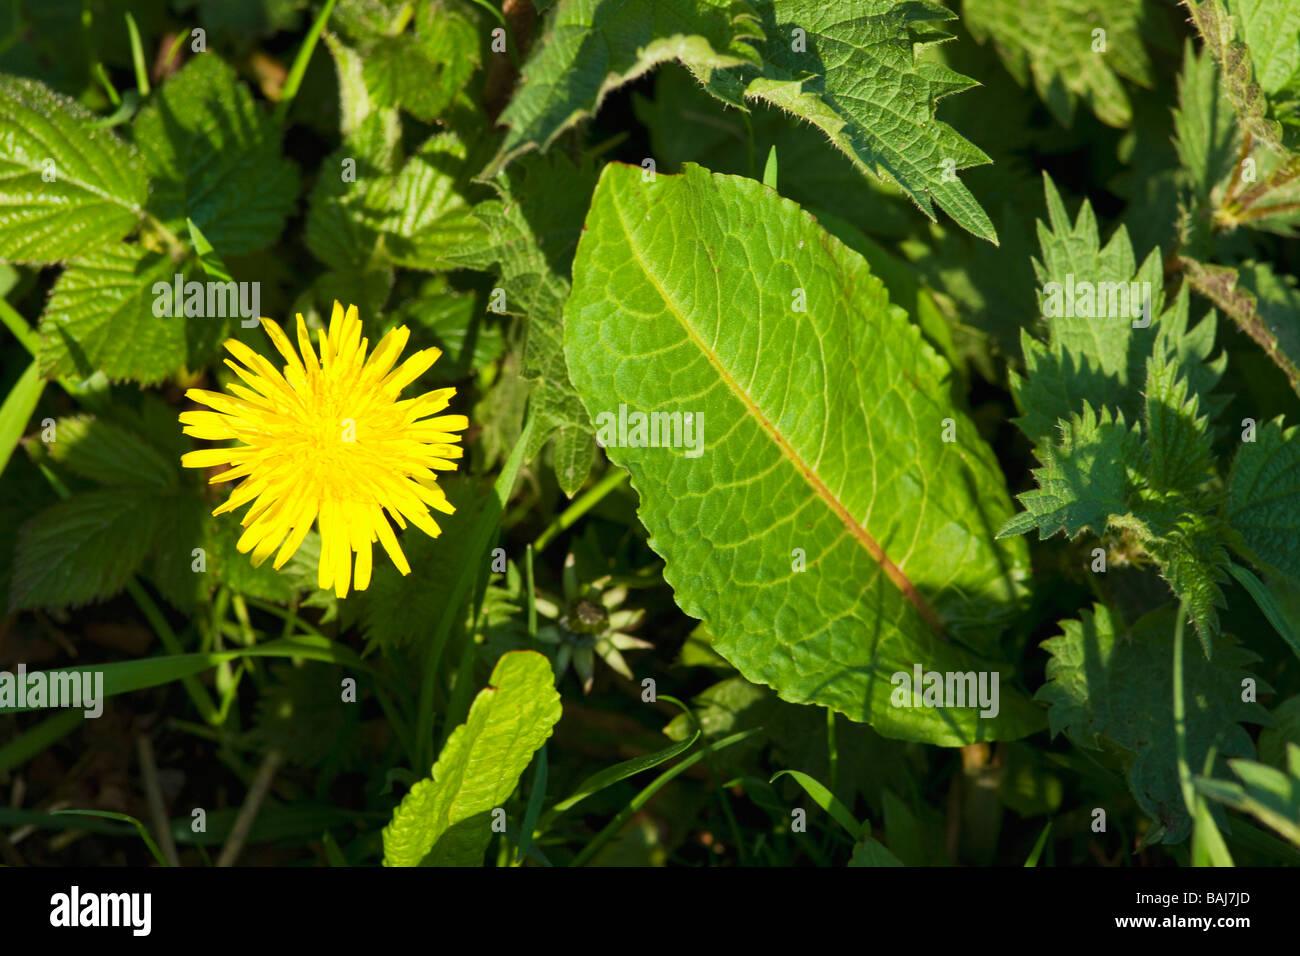 Weeds dandelion Taraxacum officinale Dock Leaf Rumex obtusifolius Stinging nettle Urtica dioica leaves England UK - Stock Image